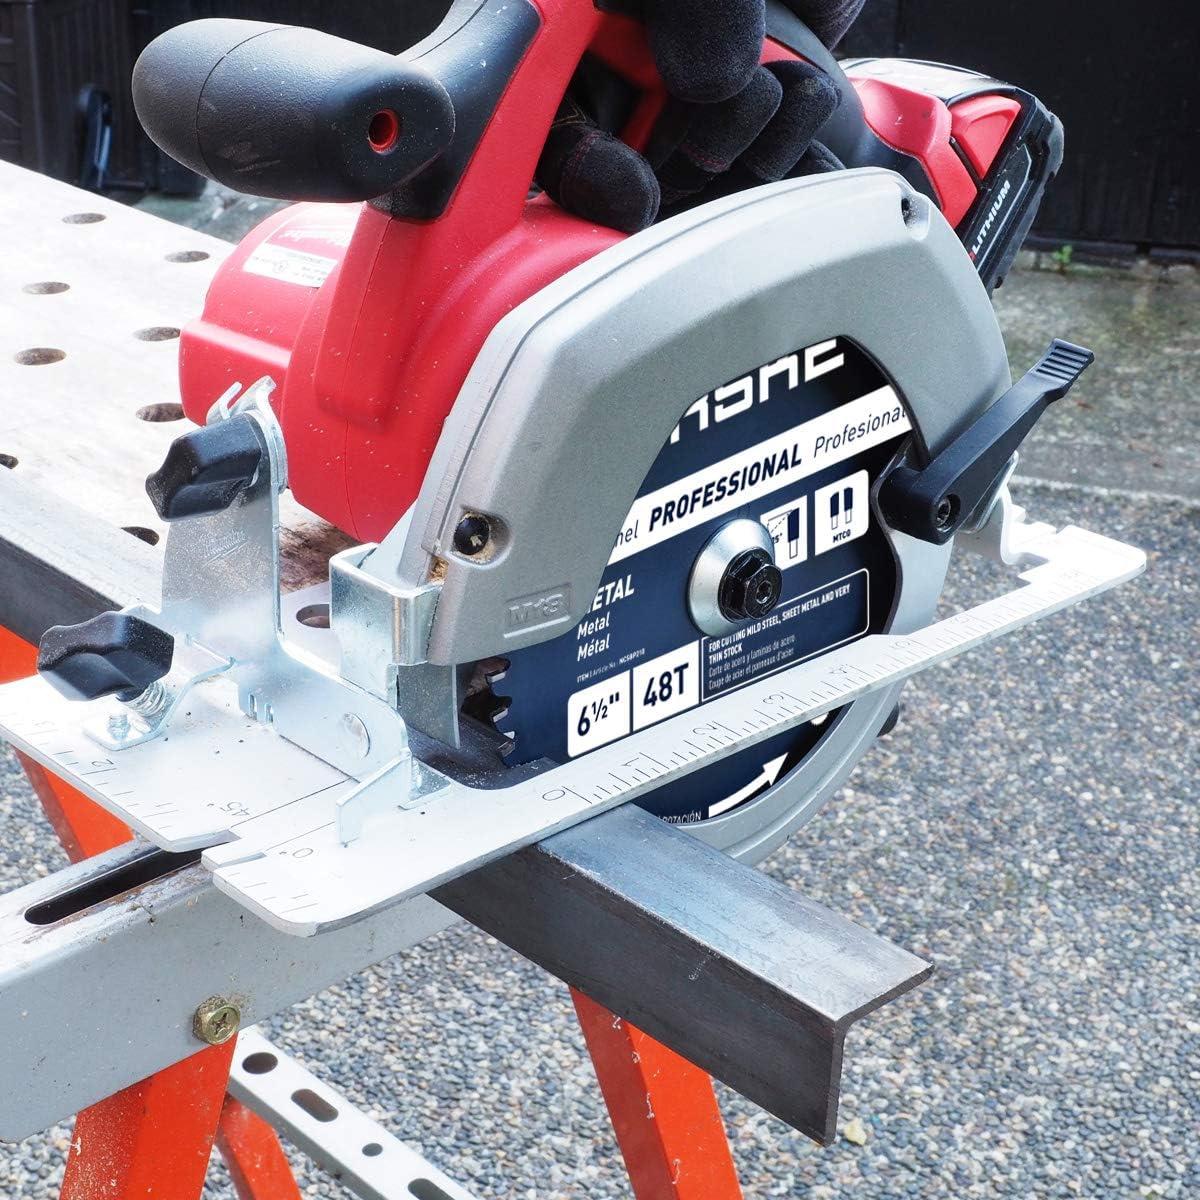 Norske Tools NCSBP210 6-½ INCH metal cutting saw blade